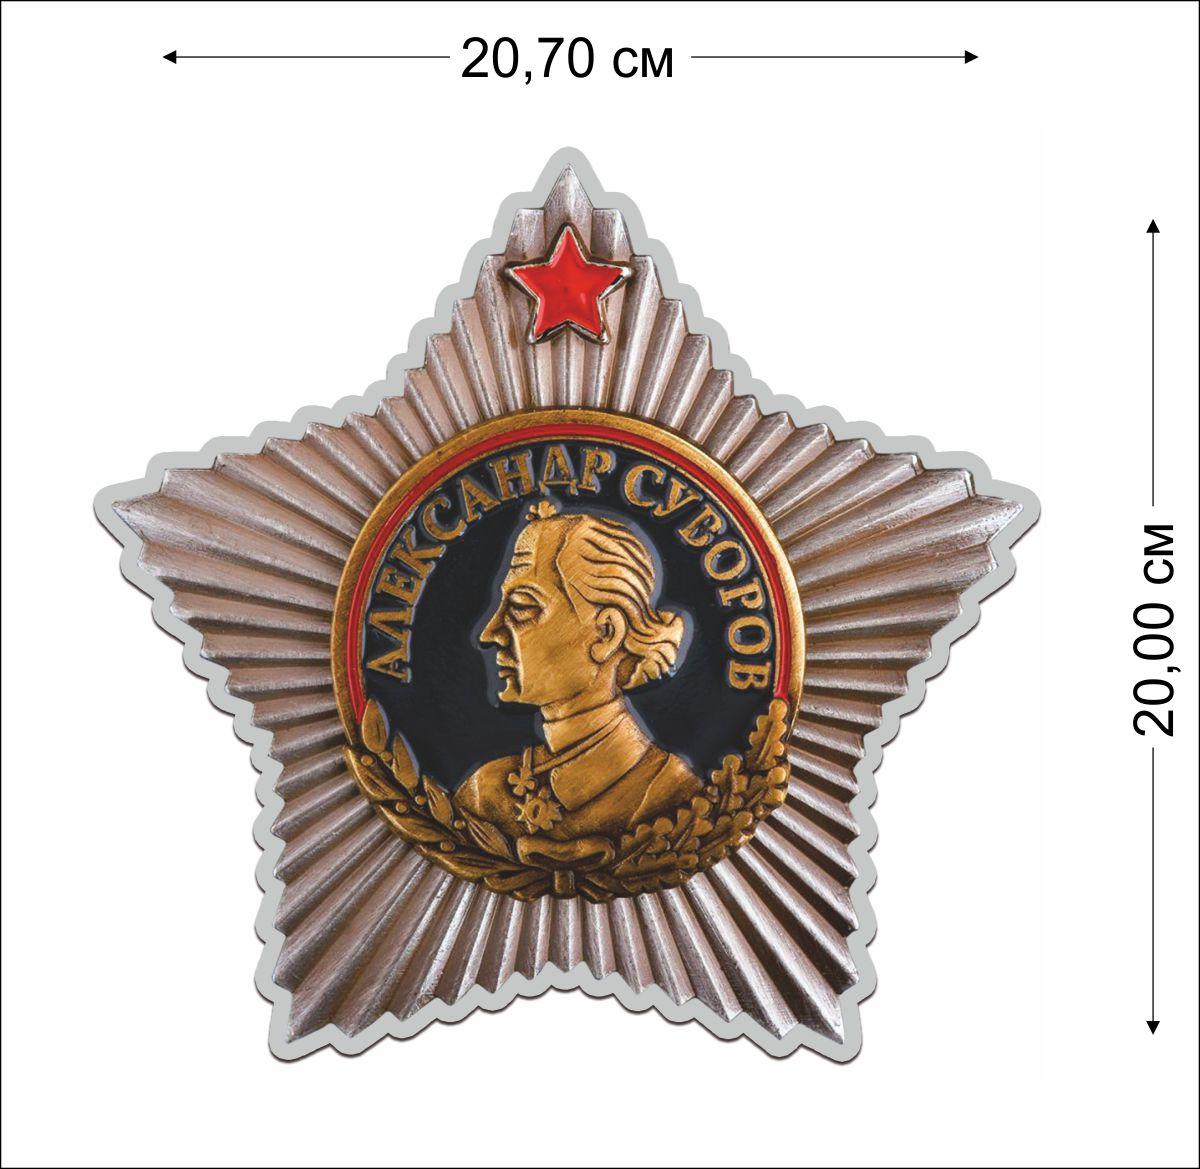 Наклейка с орденом Суворова 1 степени